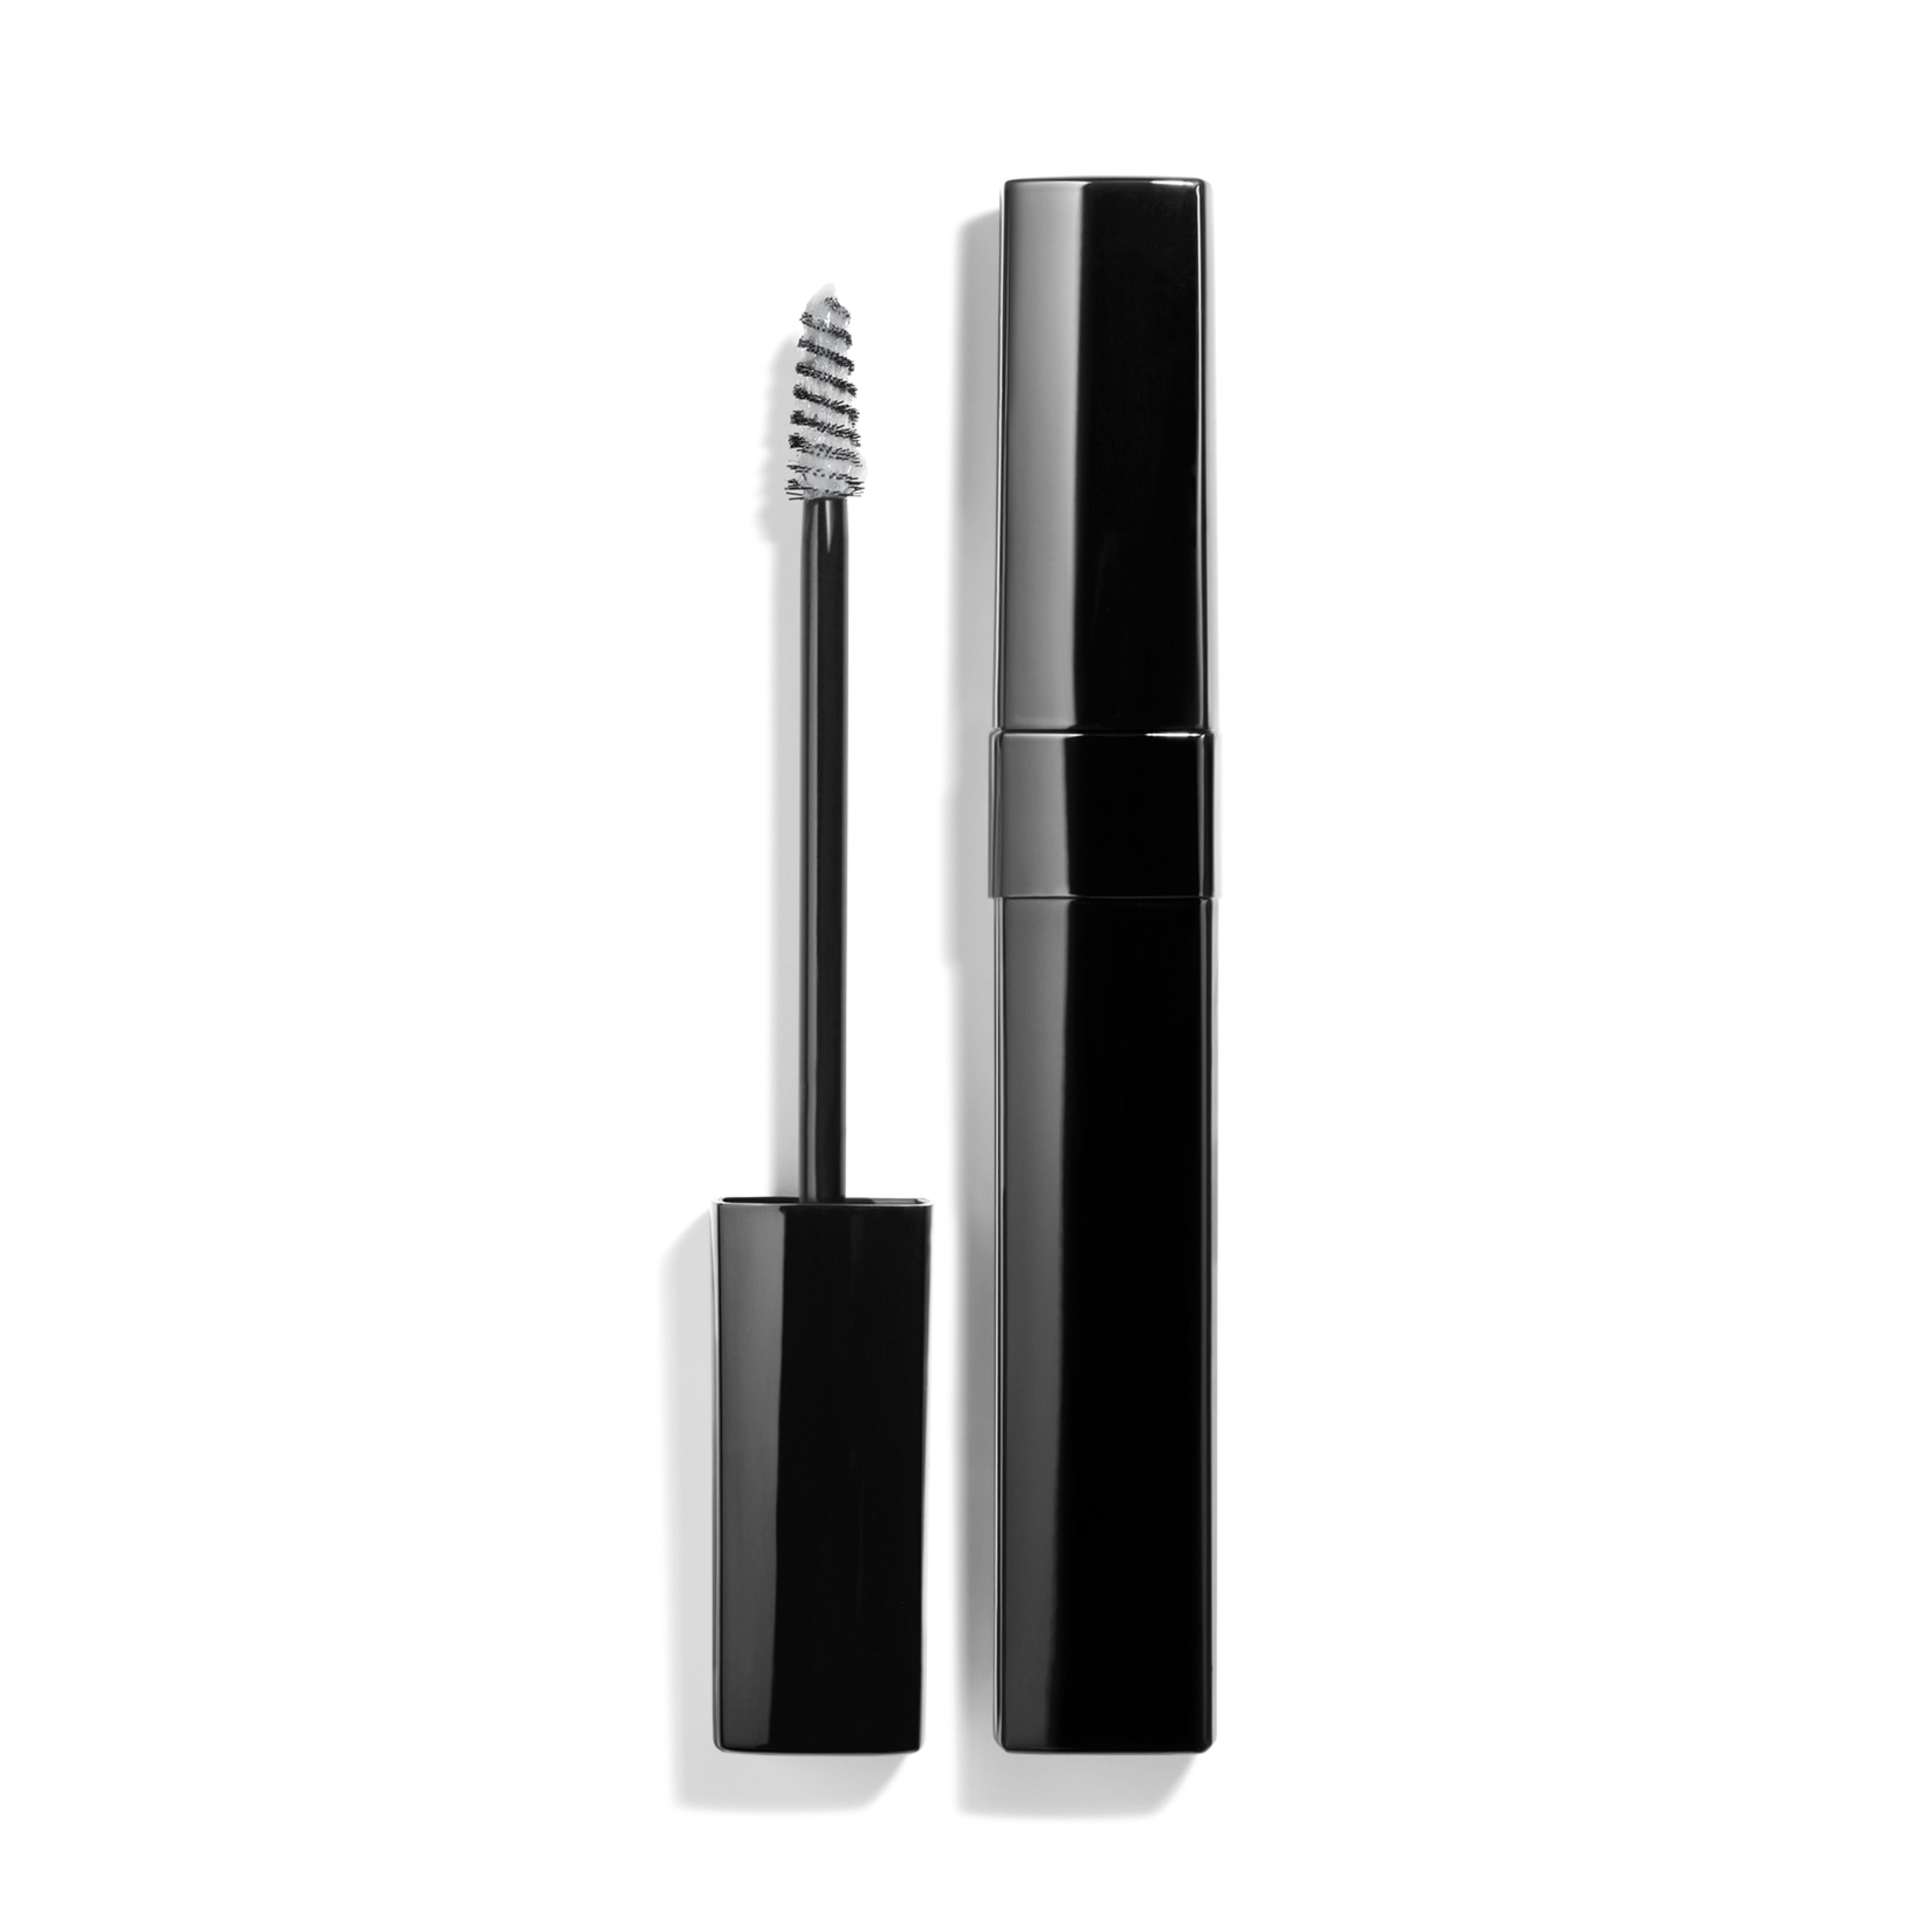 LE GEL SOURCILS - makeup - 0.21OZ. -                                                            default view - see full sized version